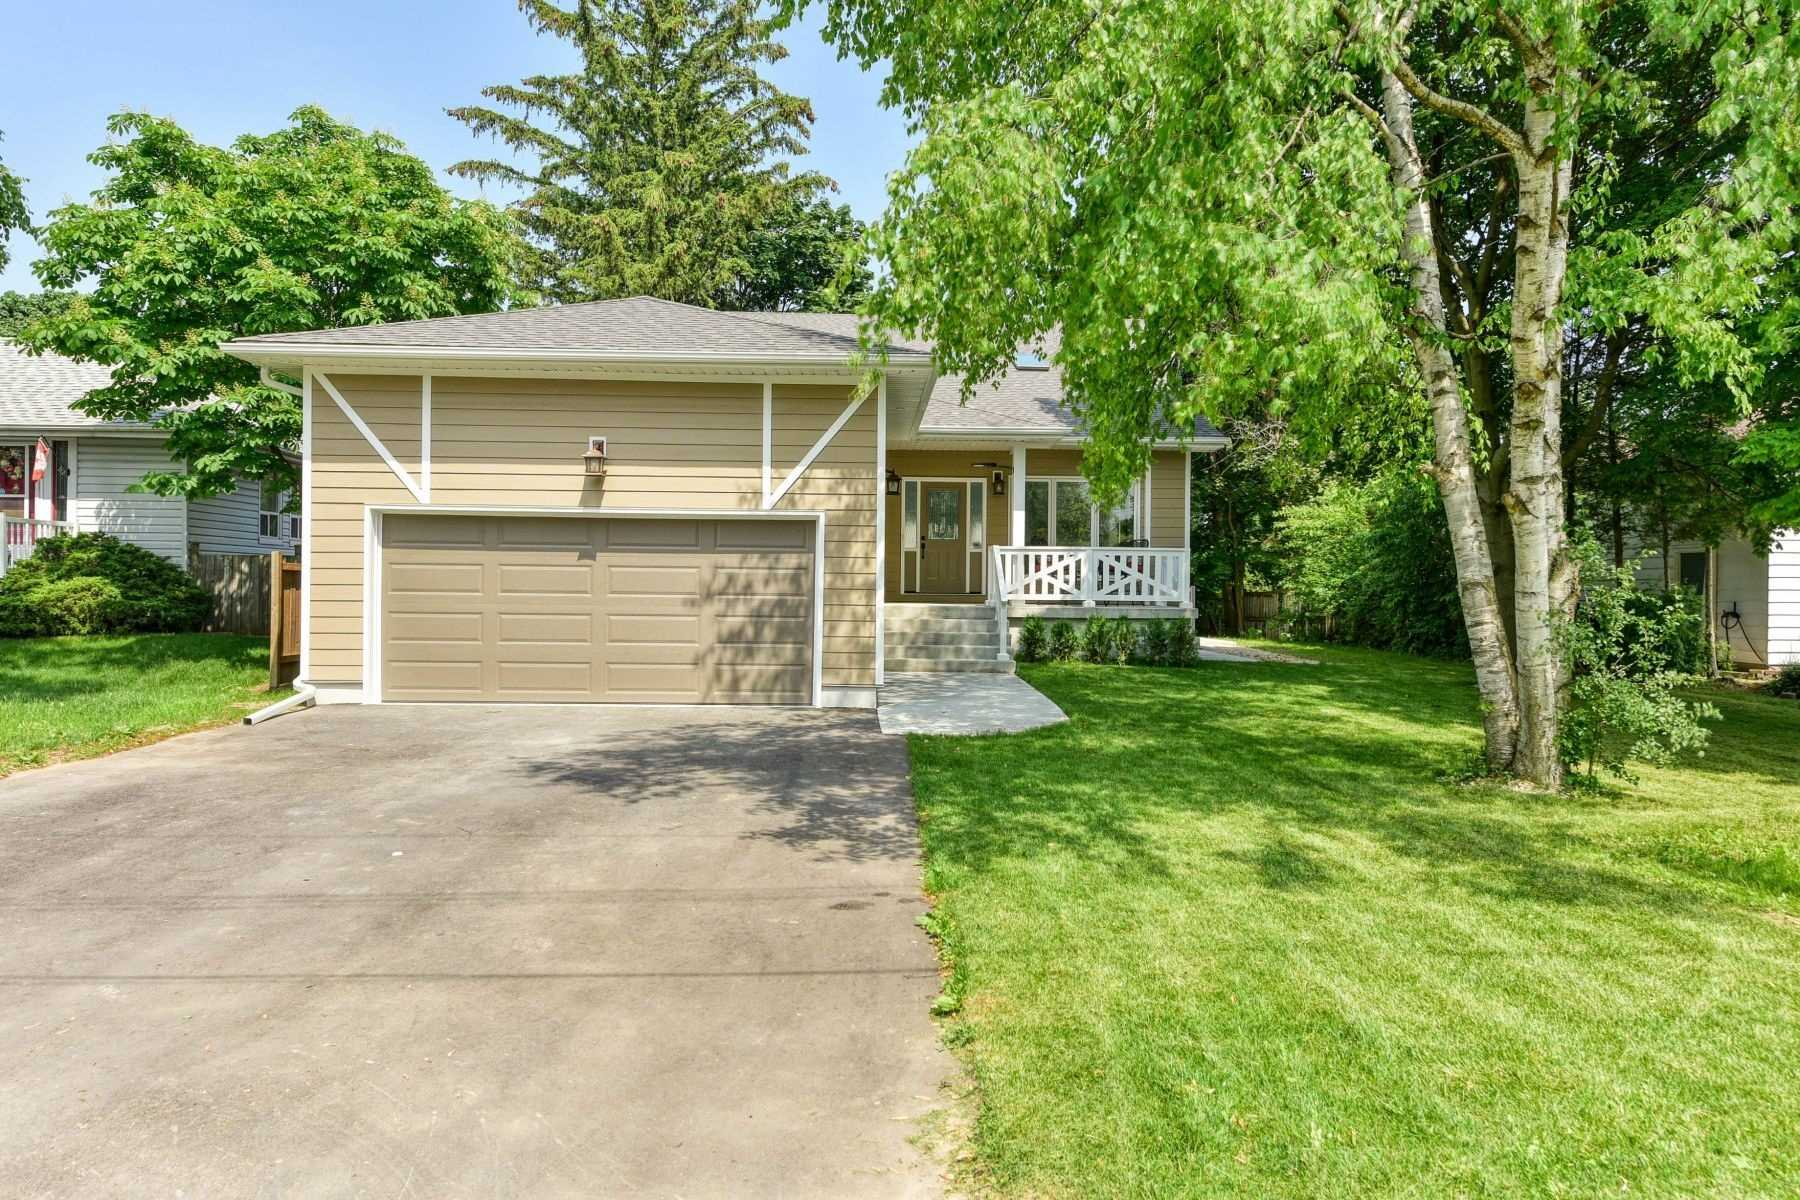 45 Poplar Rd, Toronto, Ontario M1E1Z2, 4 Bedrooms Bedrooms, 8 Rooms Rooms,4 BathroomsBathrooms,Detached,For Sale,Poplar,E5270614